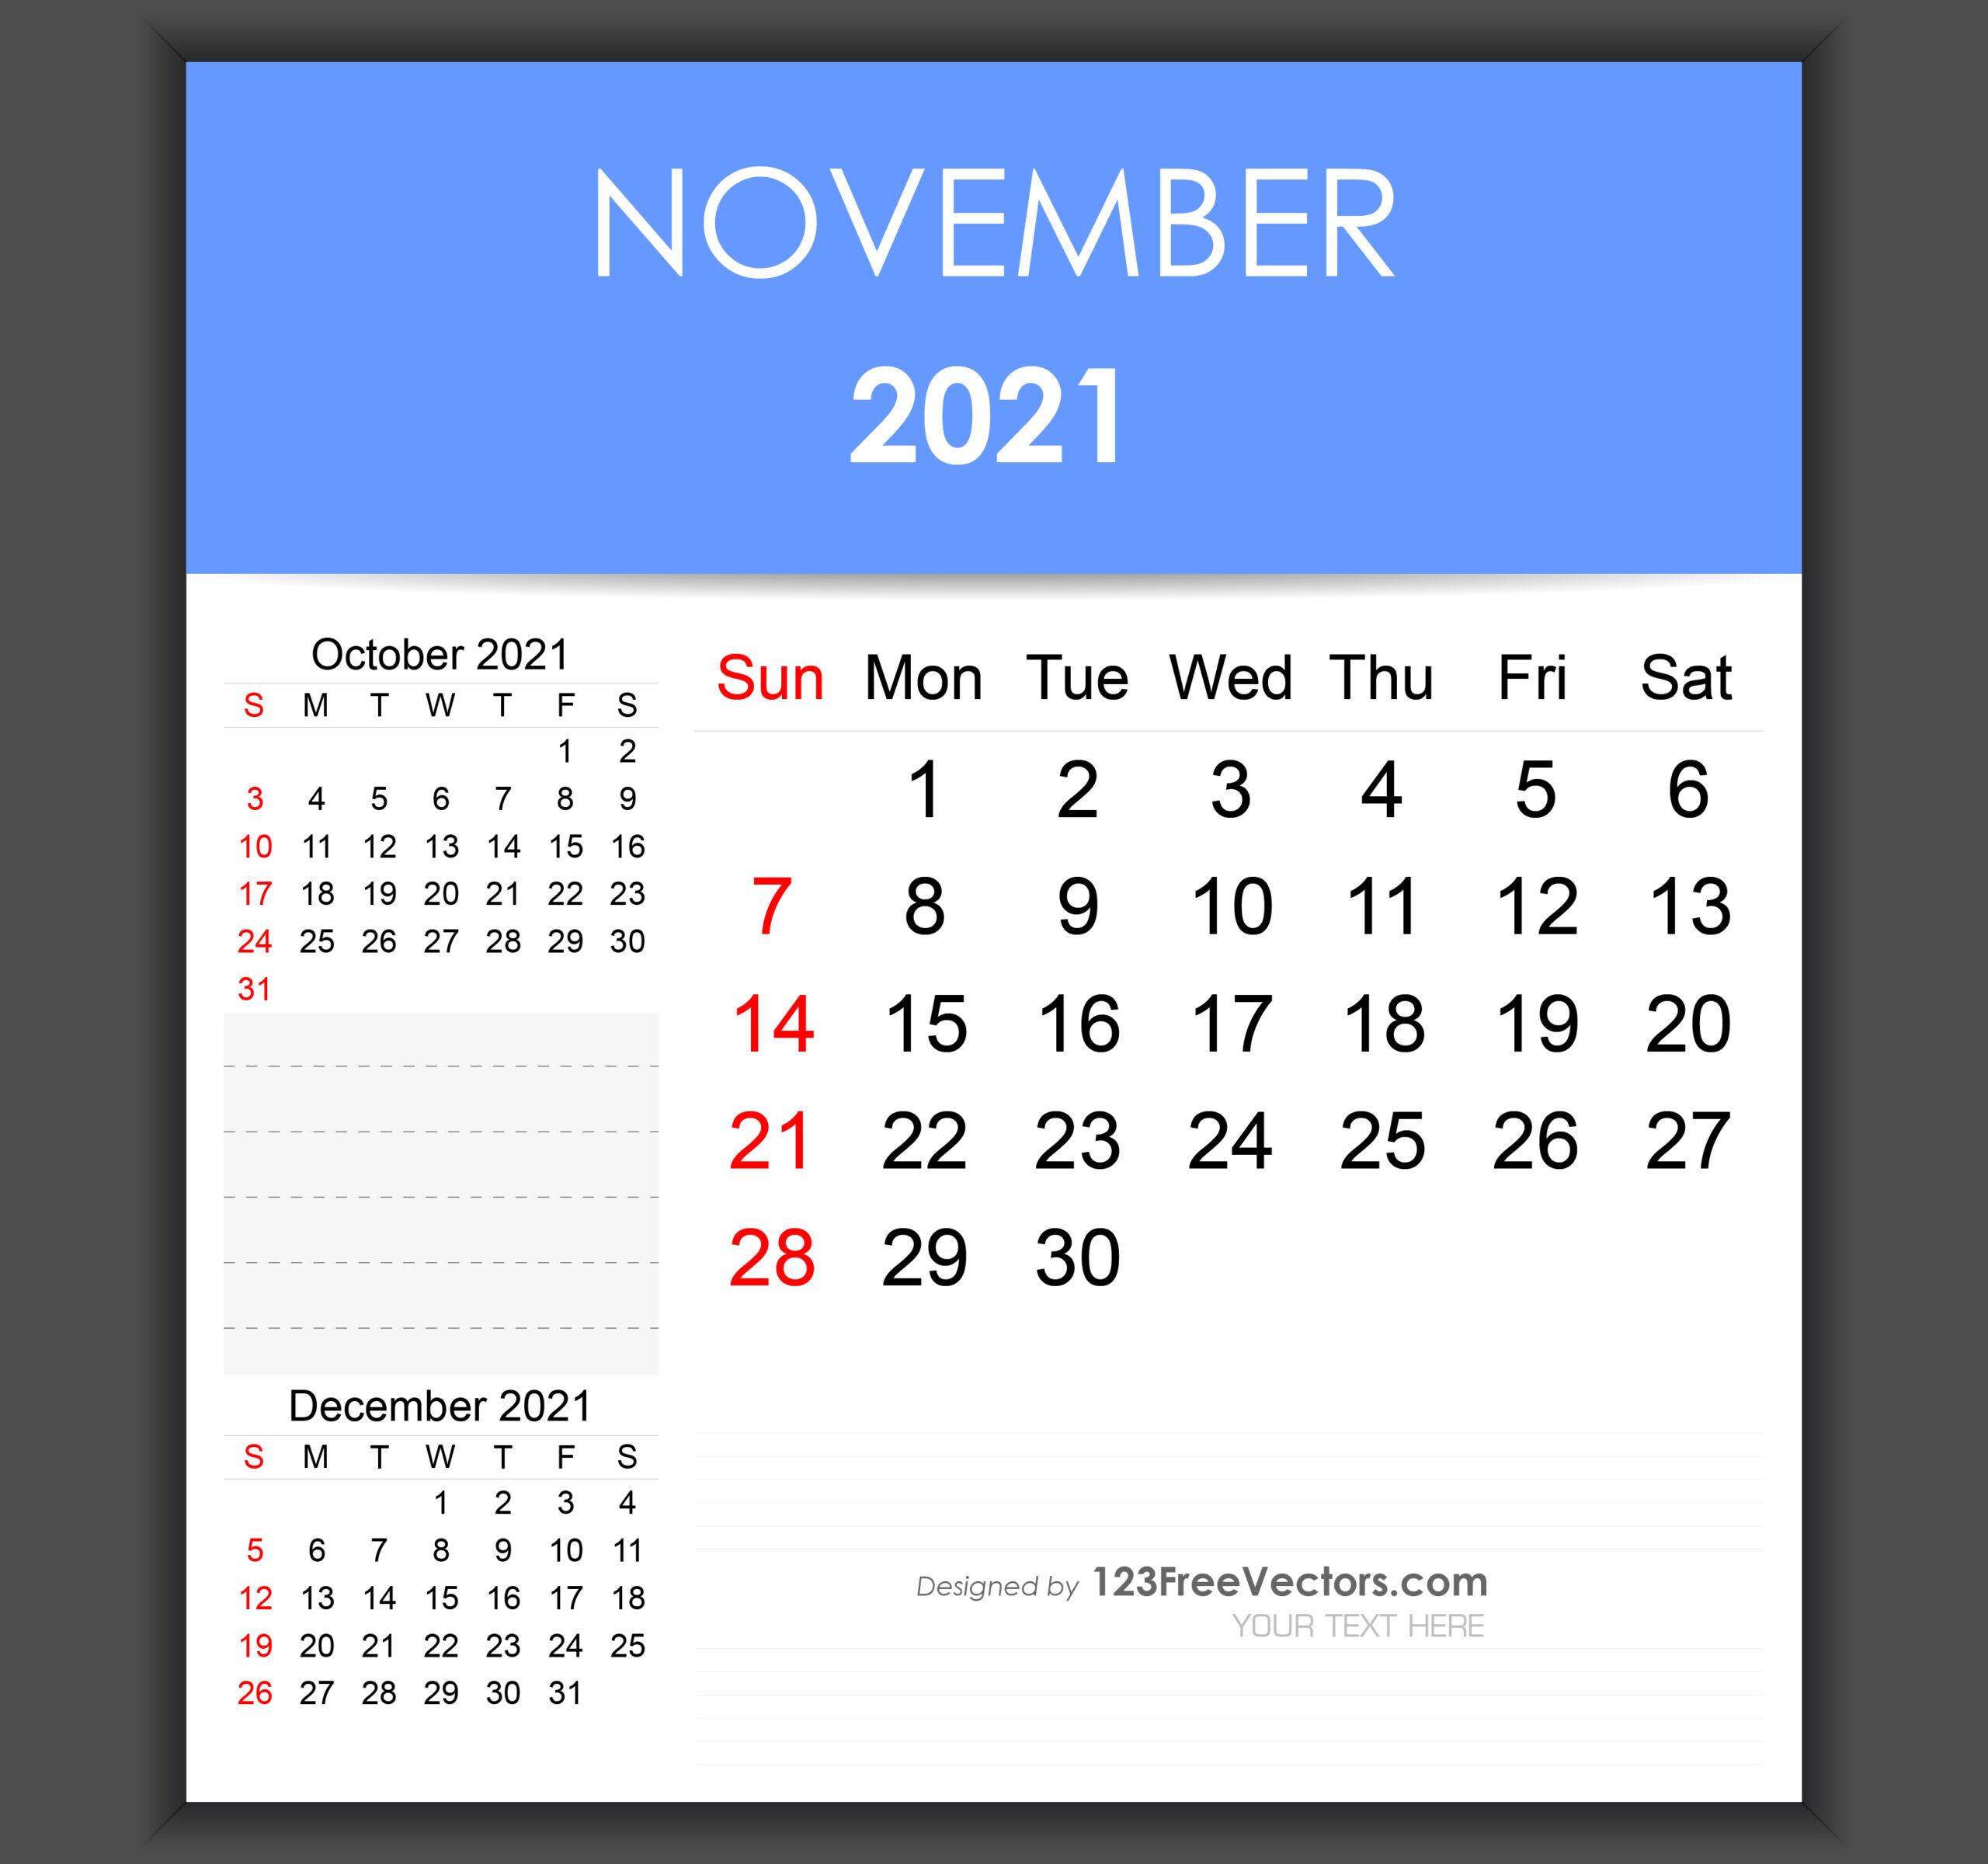 Free Editable November 2021 Calendar Template